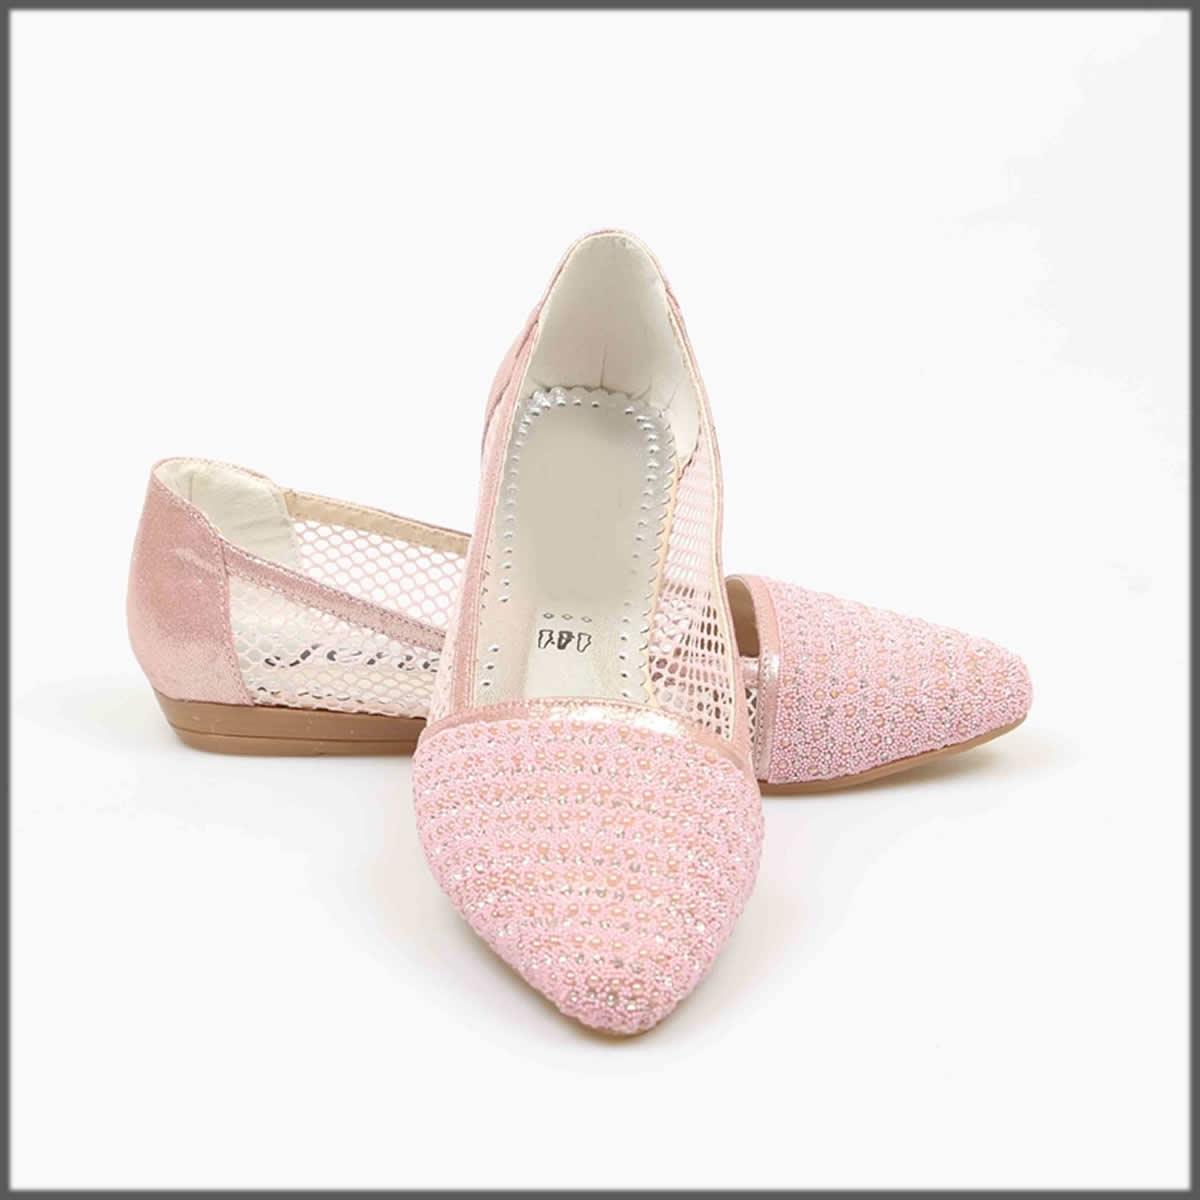 Stylish footwear for teens